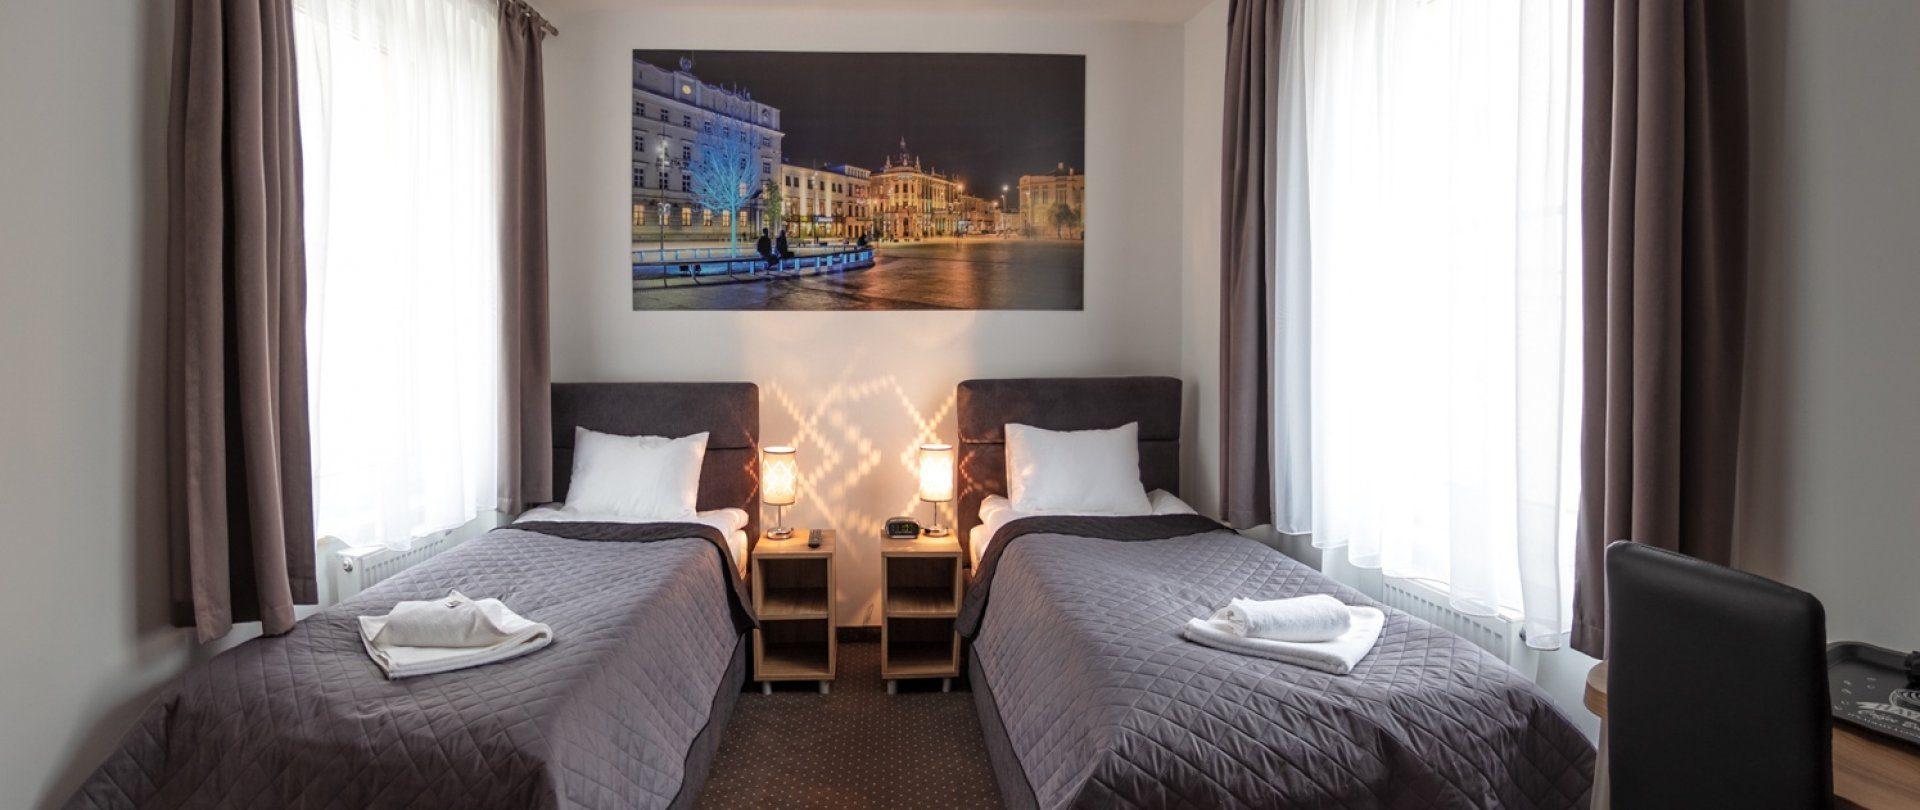 Lublin Hotel, Lublin